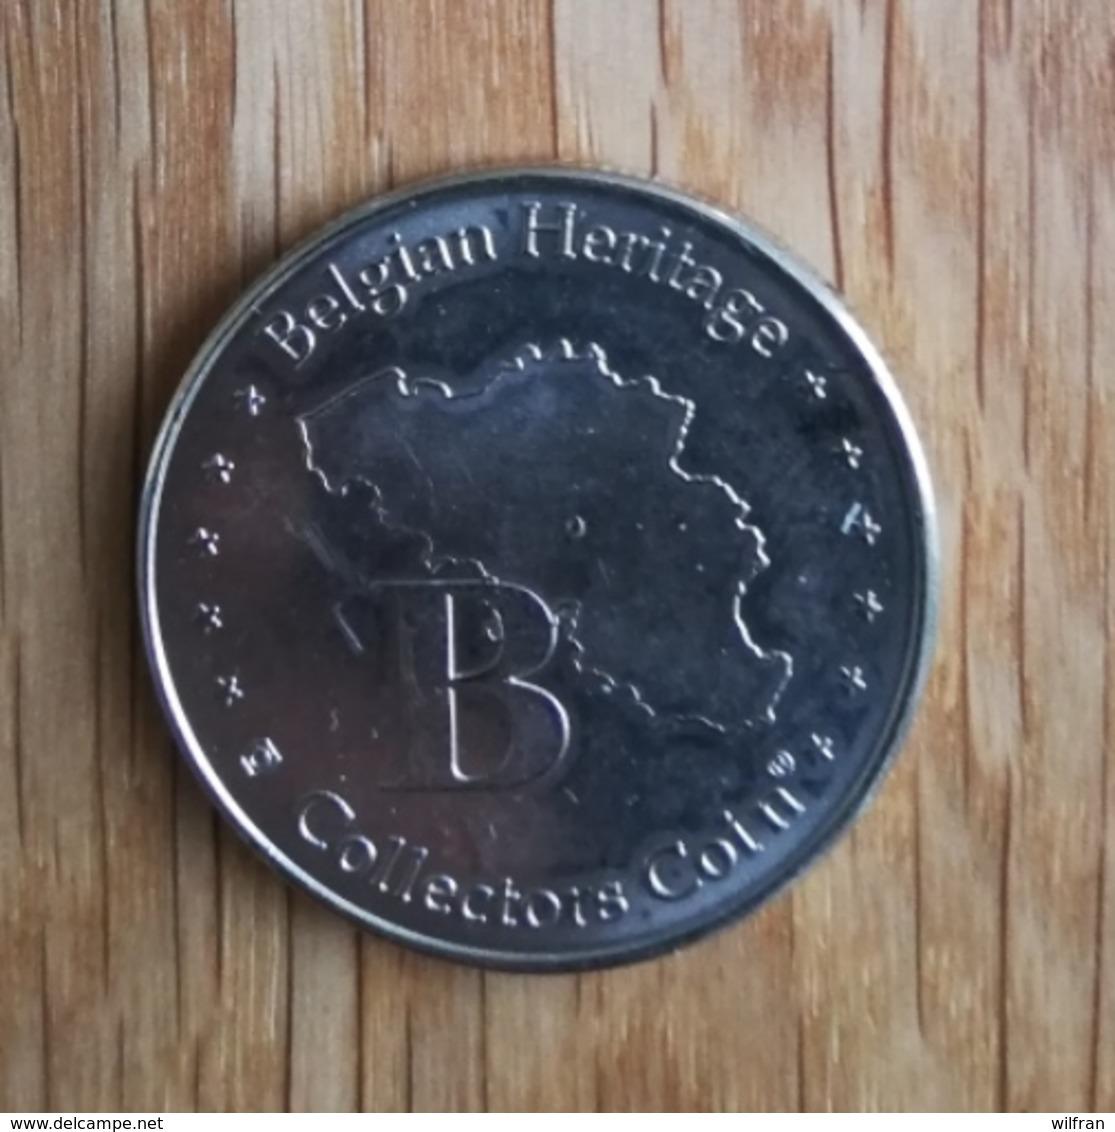 3266 Vz Stadhuis Musea Brugge - Kz Belgian Heritage Collectors Coin - Altri